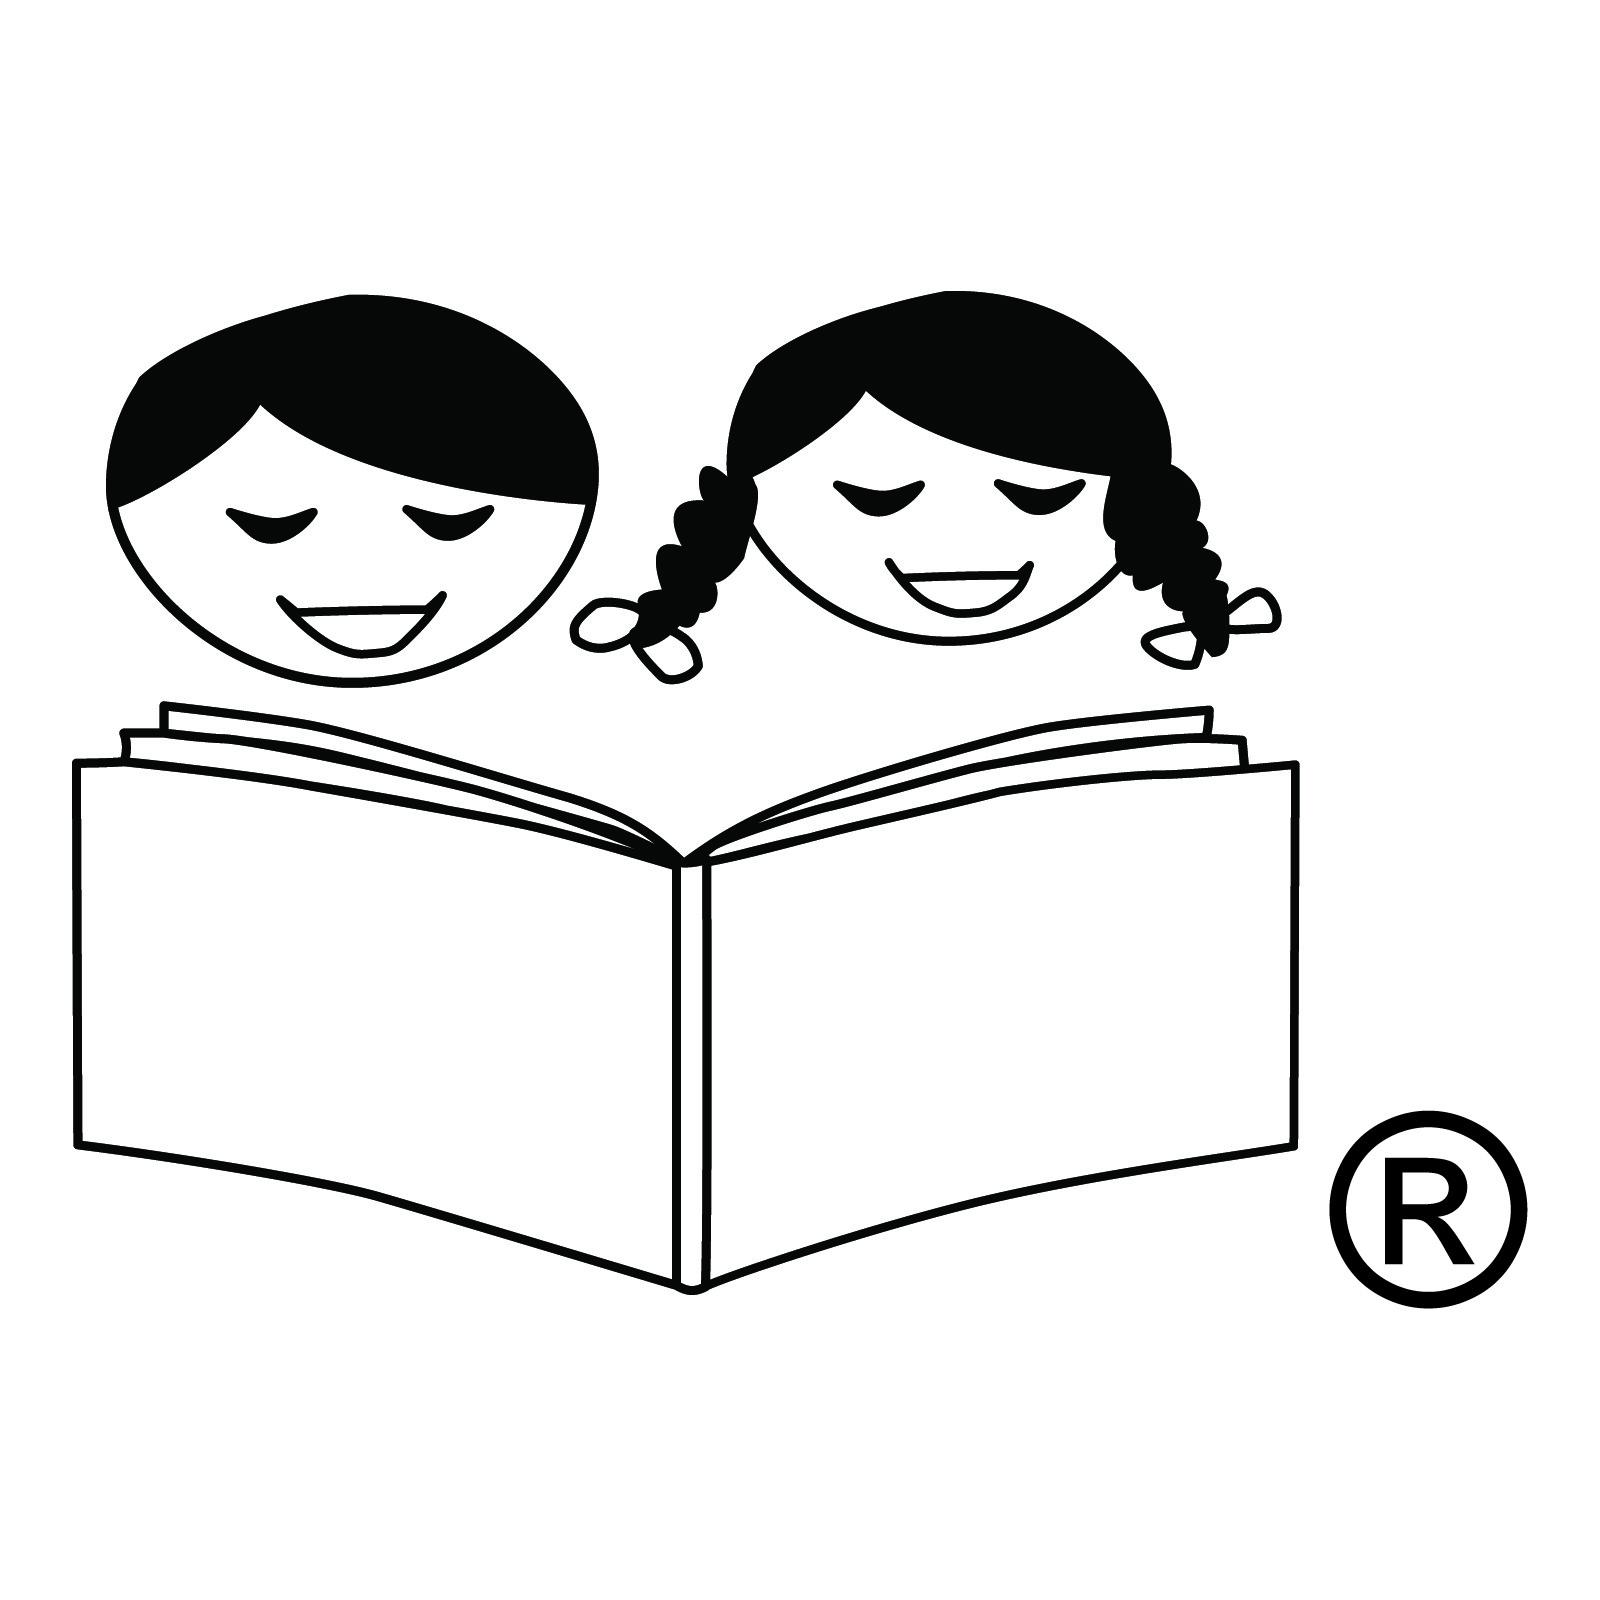 Educative Information: Education System in Bangladesh